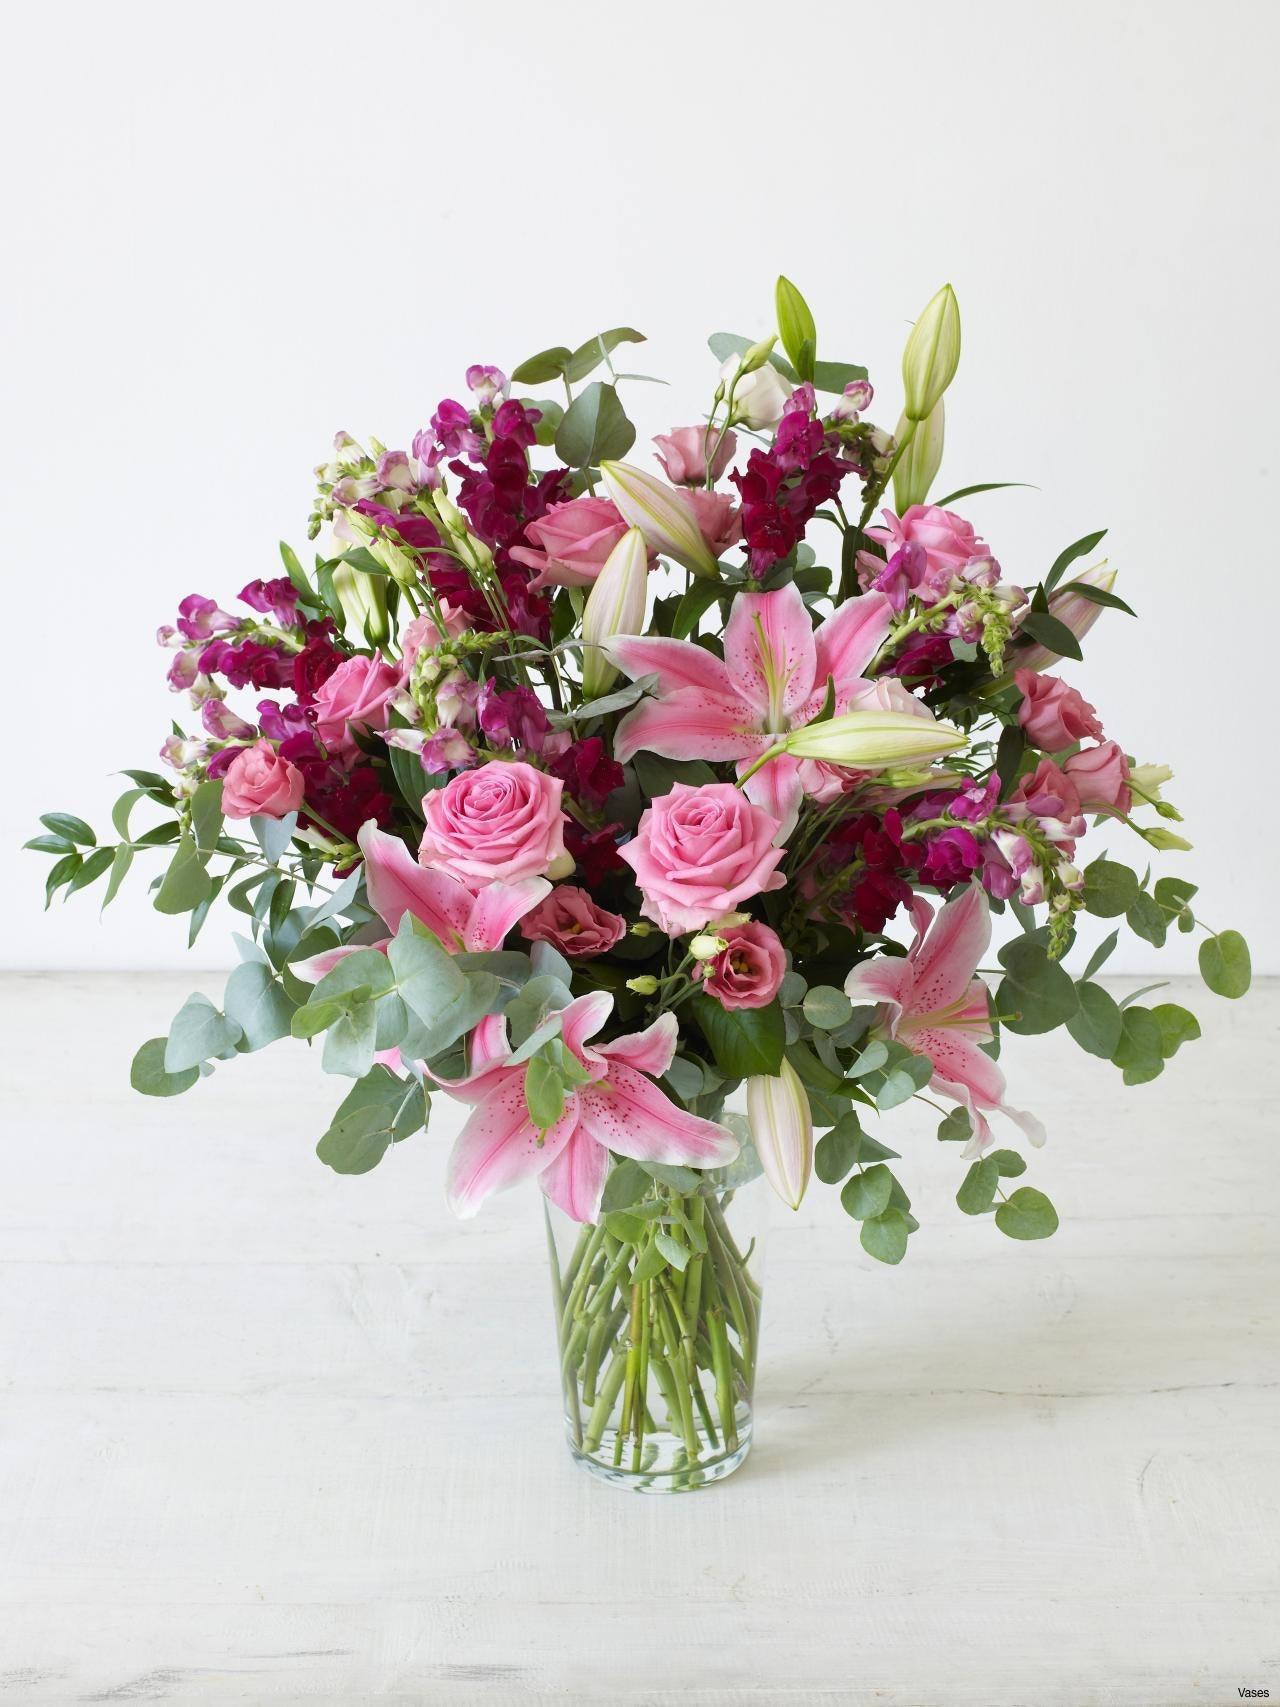 Best Birthday Delivery Gifts Unique 40 Best Fake Wedding Bouquets